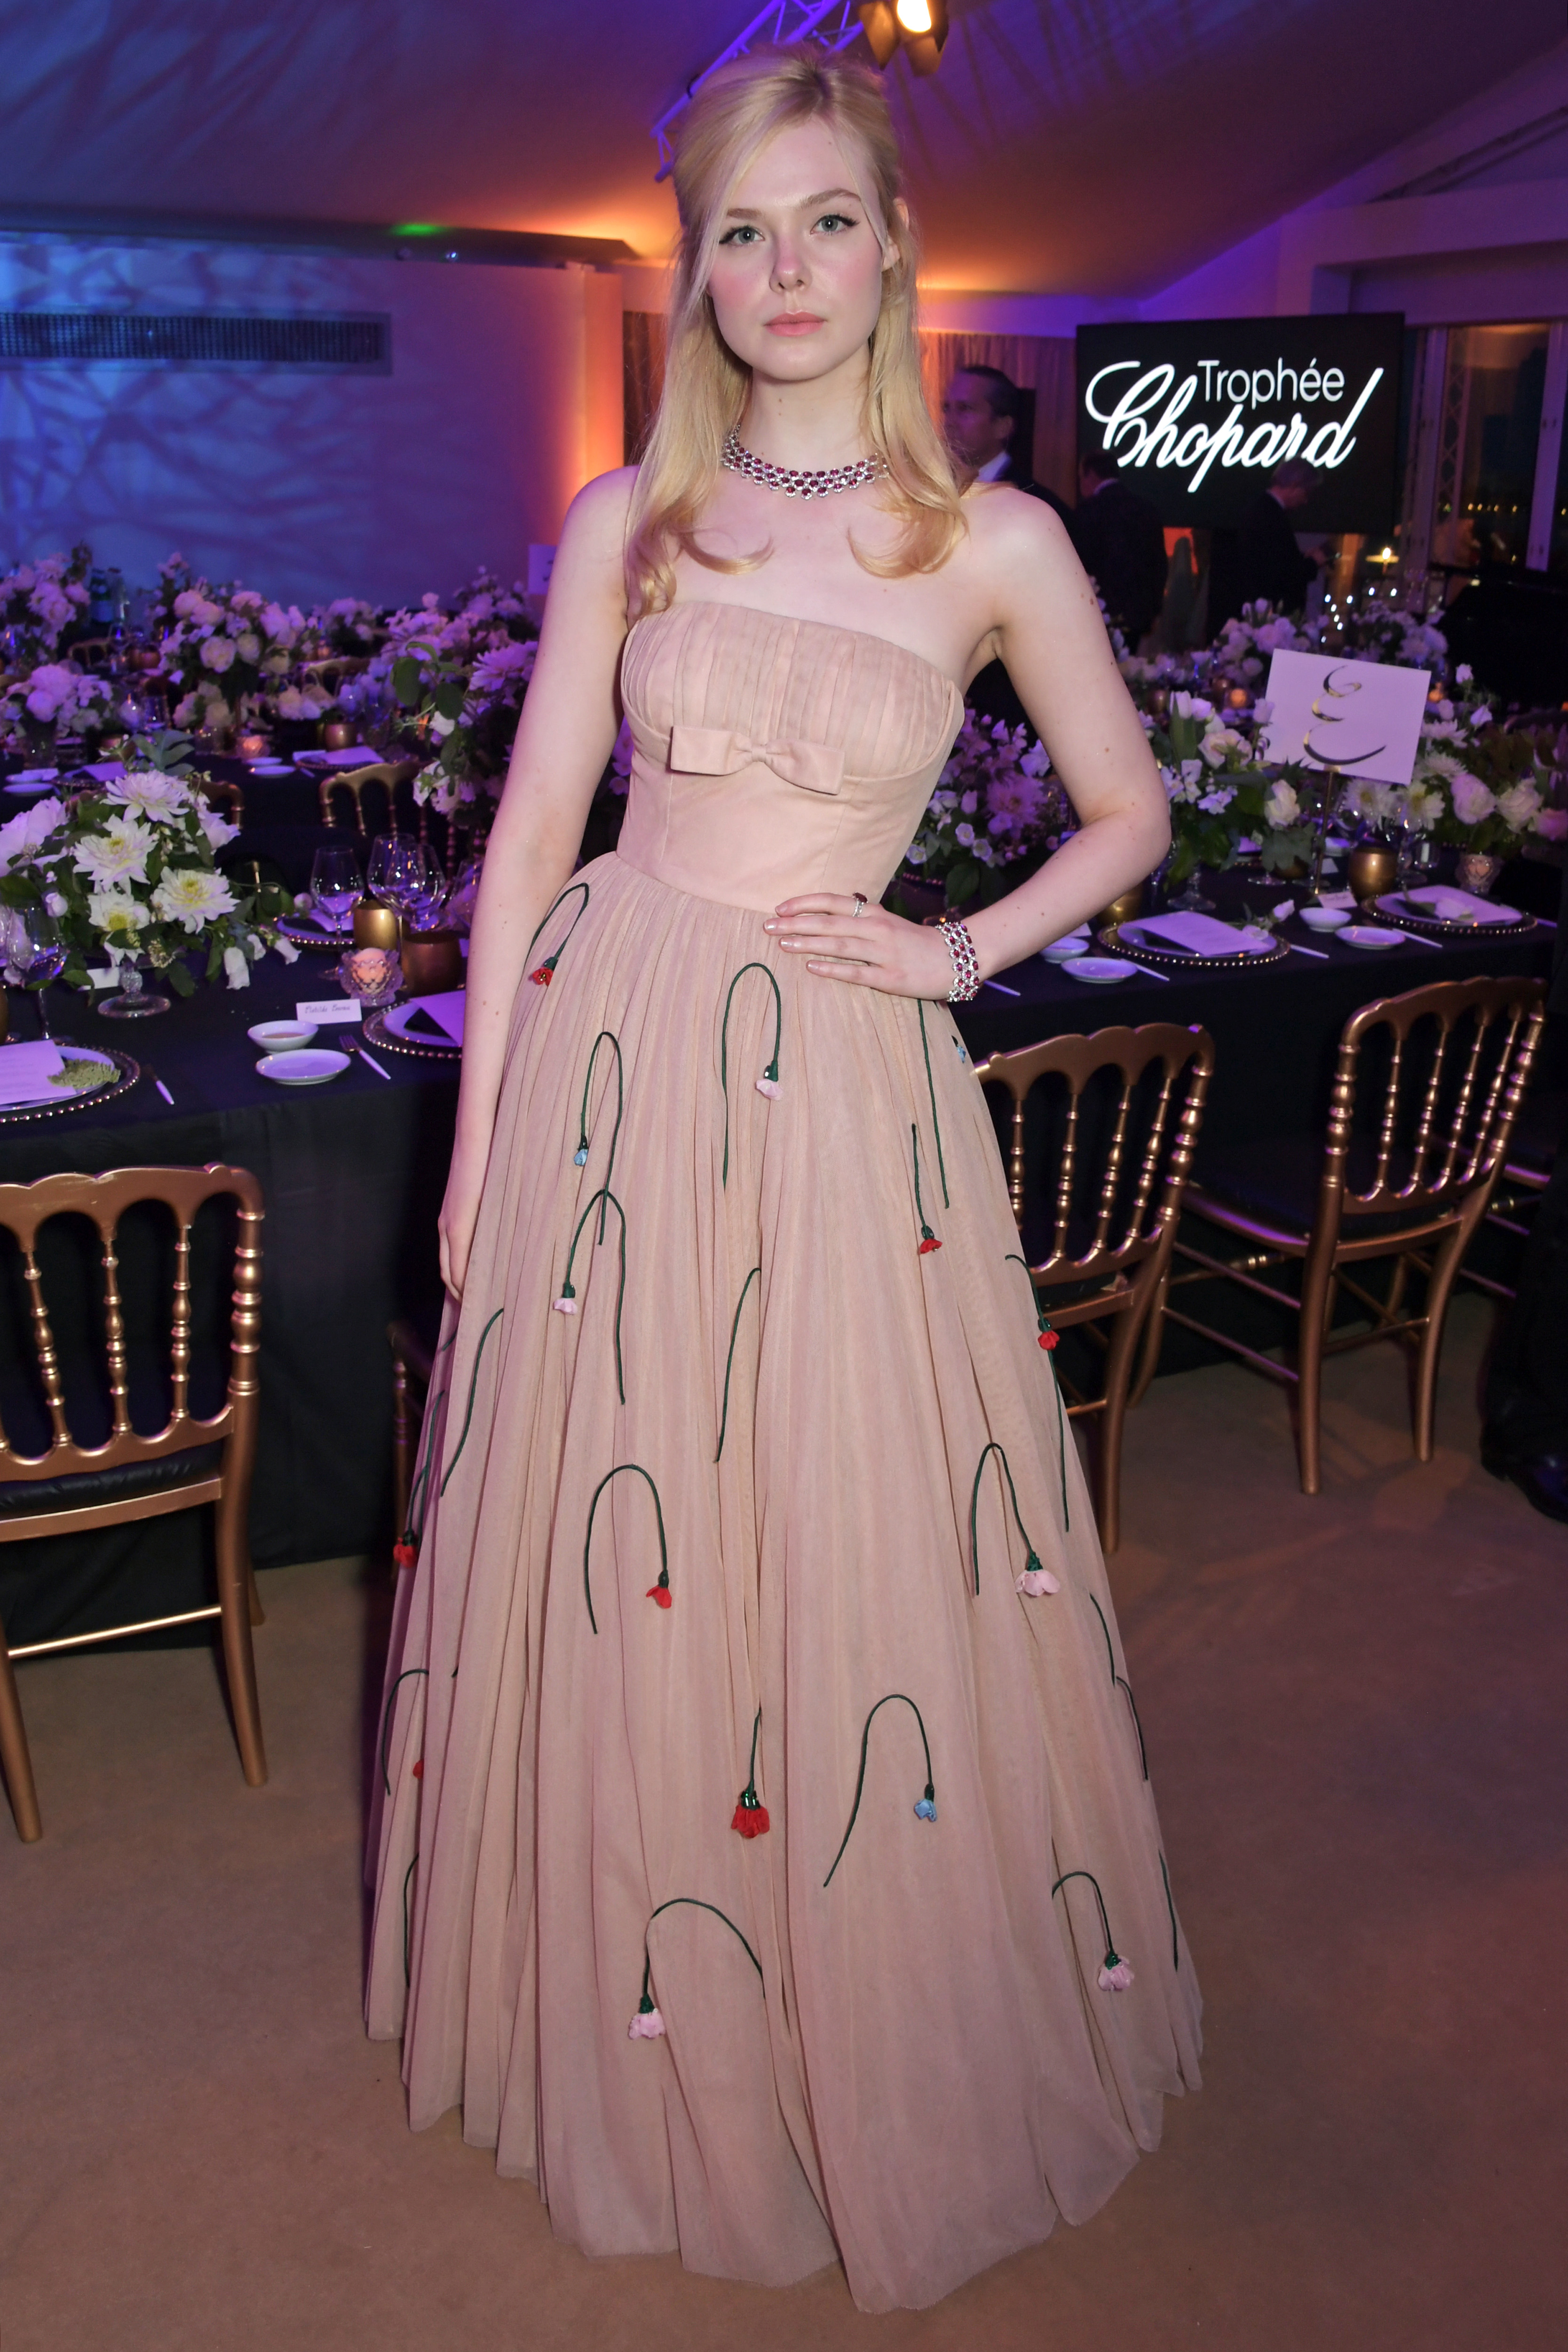 ELle Fanning Vestido Prada Desmaia em Cannes